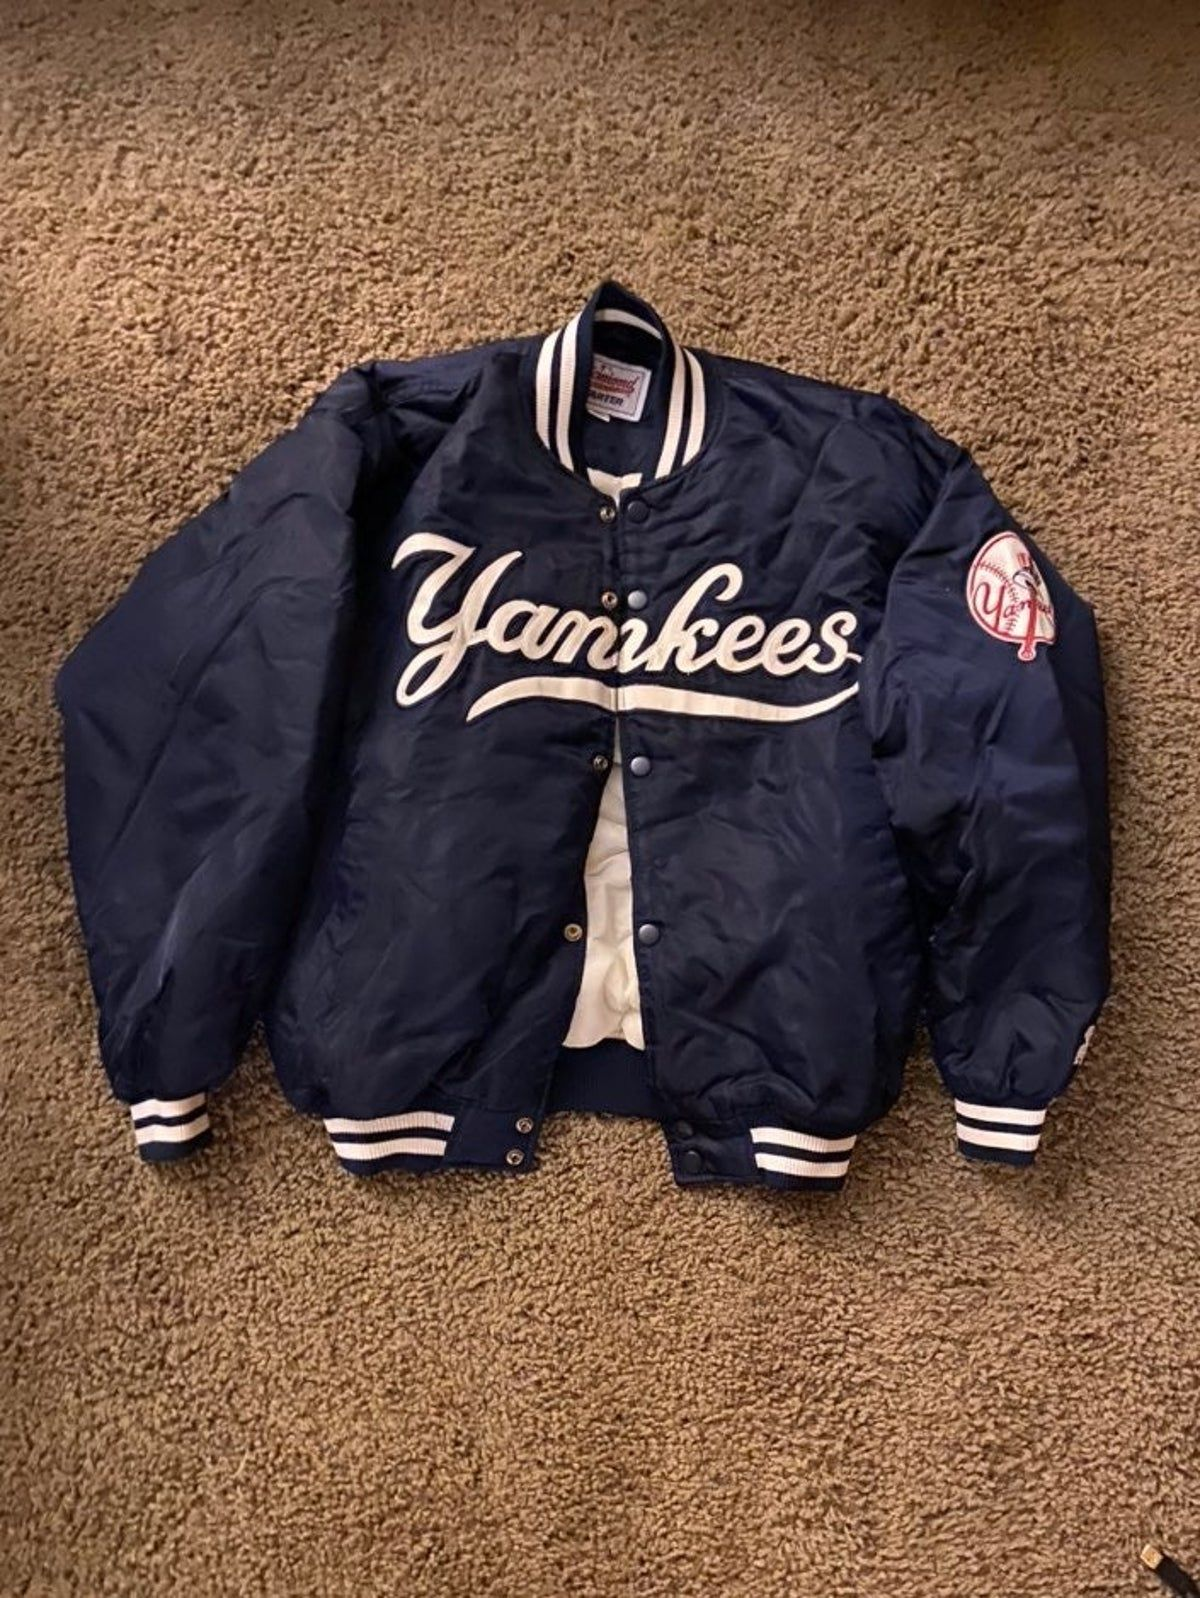 Yankees Starter Jacket Streetwear Men Outfits Bomber Jacket Vintage Stylish Hoodies [ 1598 x 1200 Pixel ]